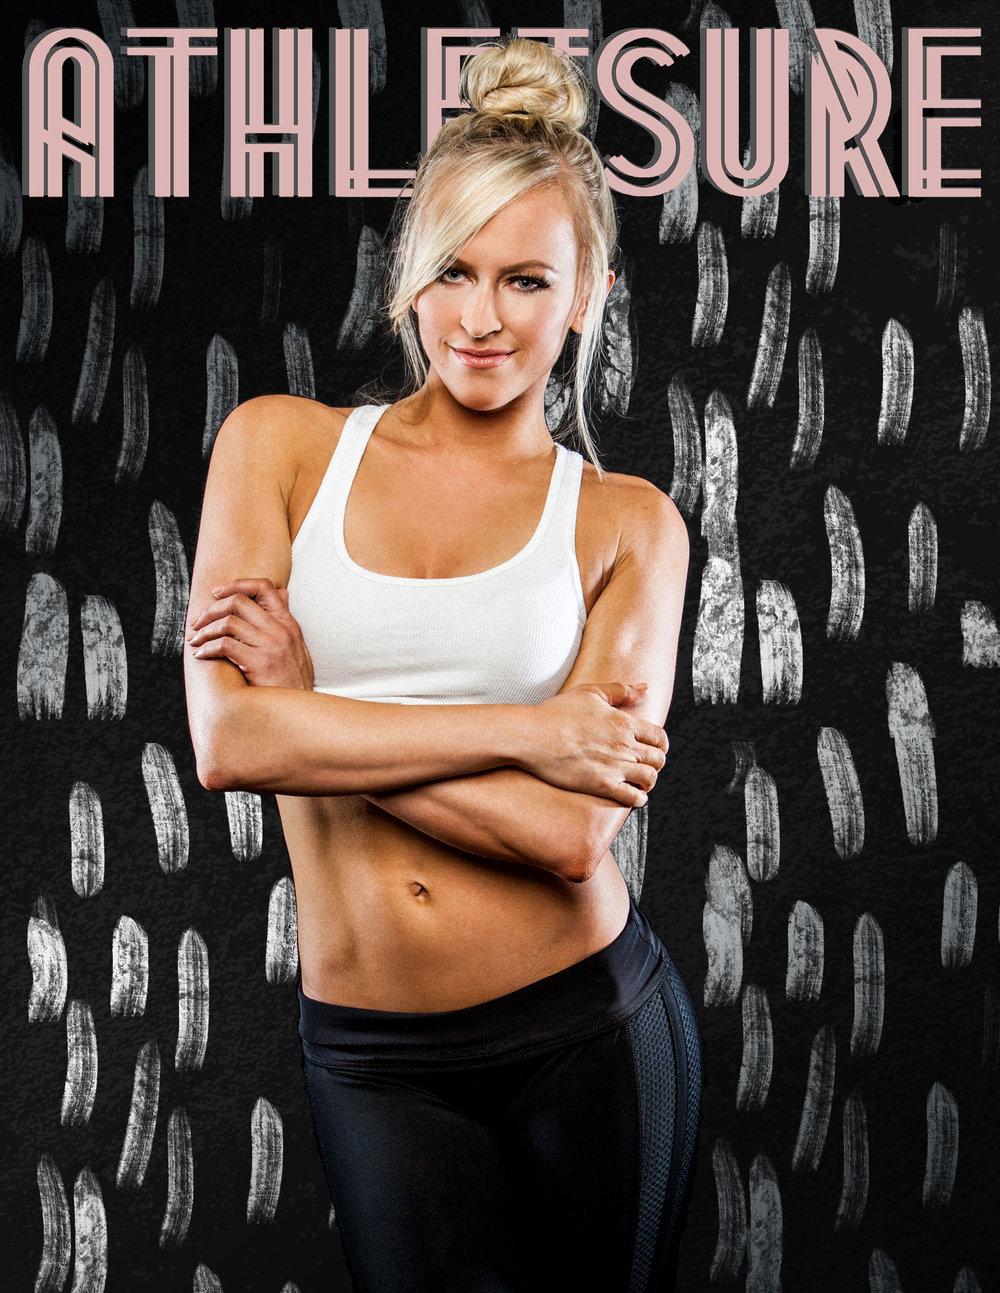 Danielle Moinet aka WWE Summer Rae